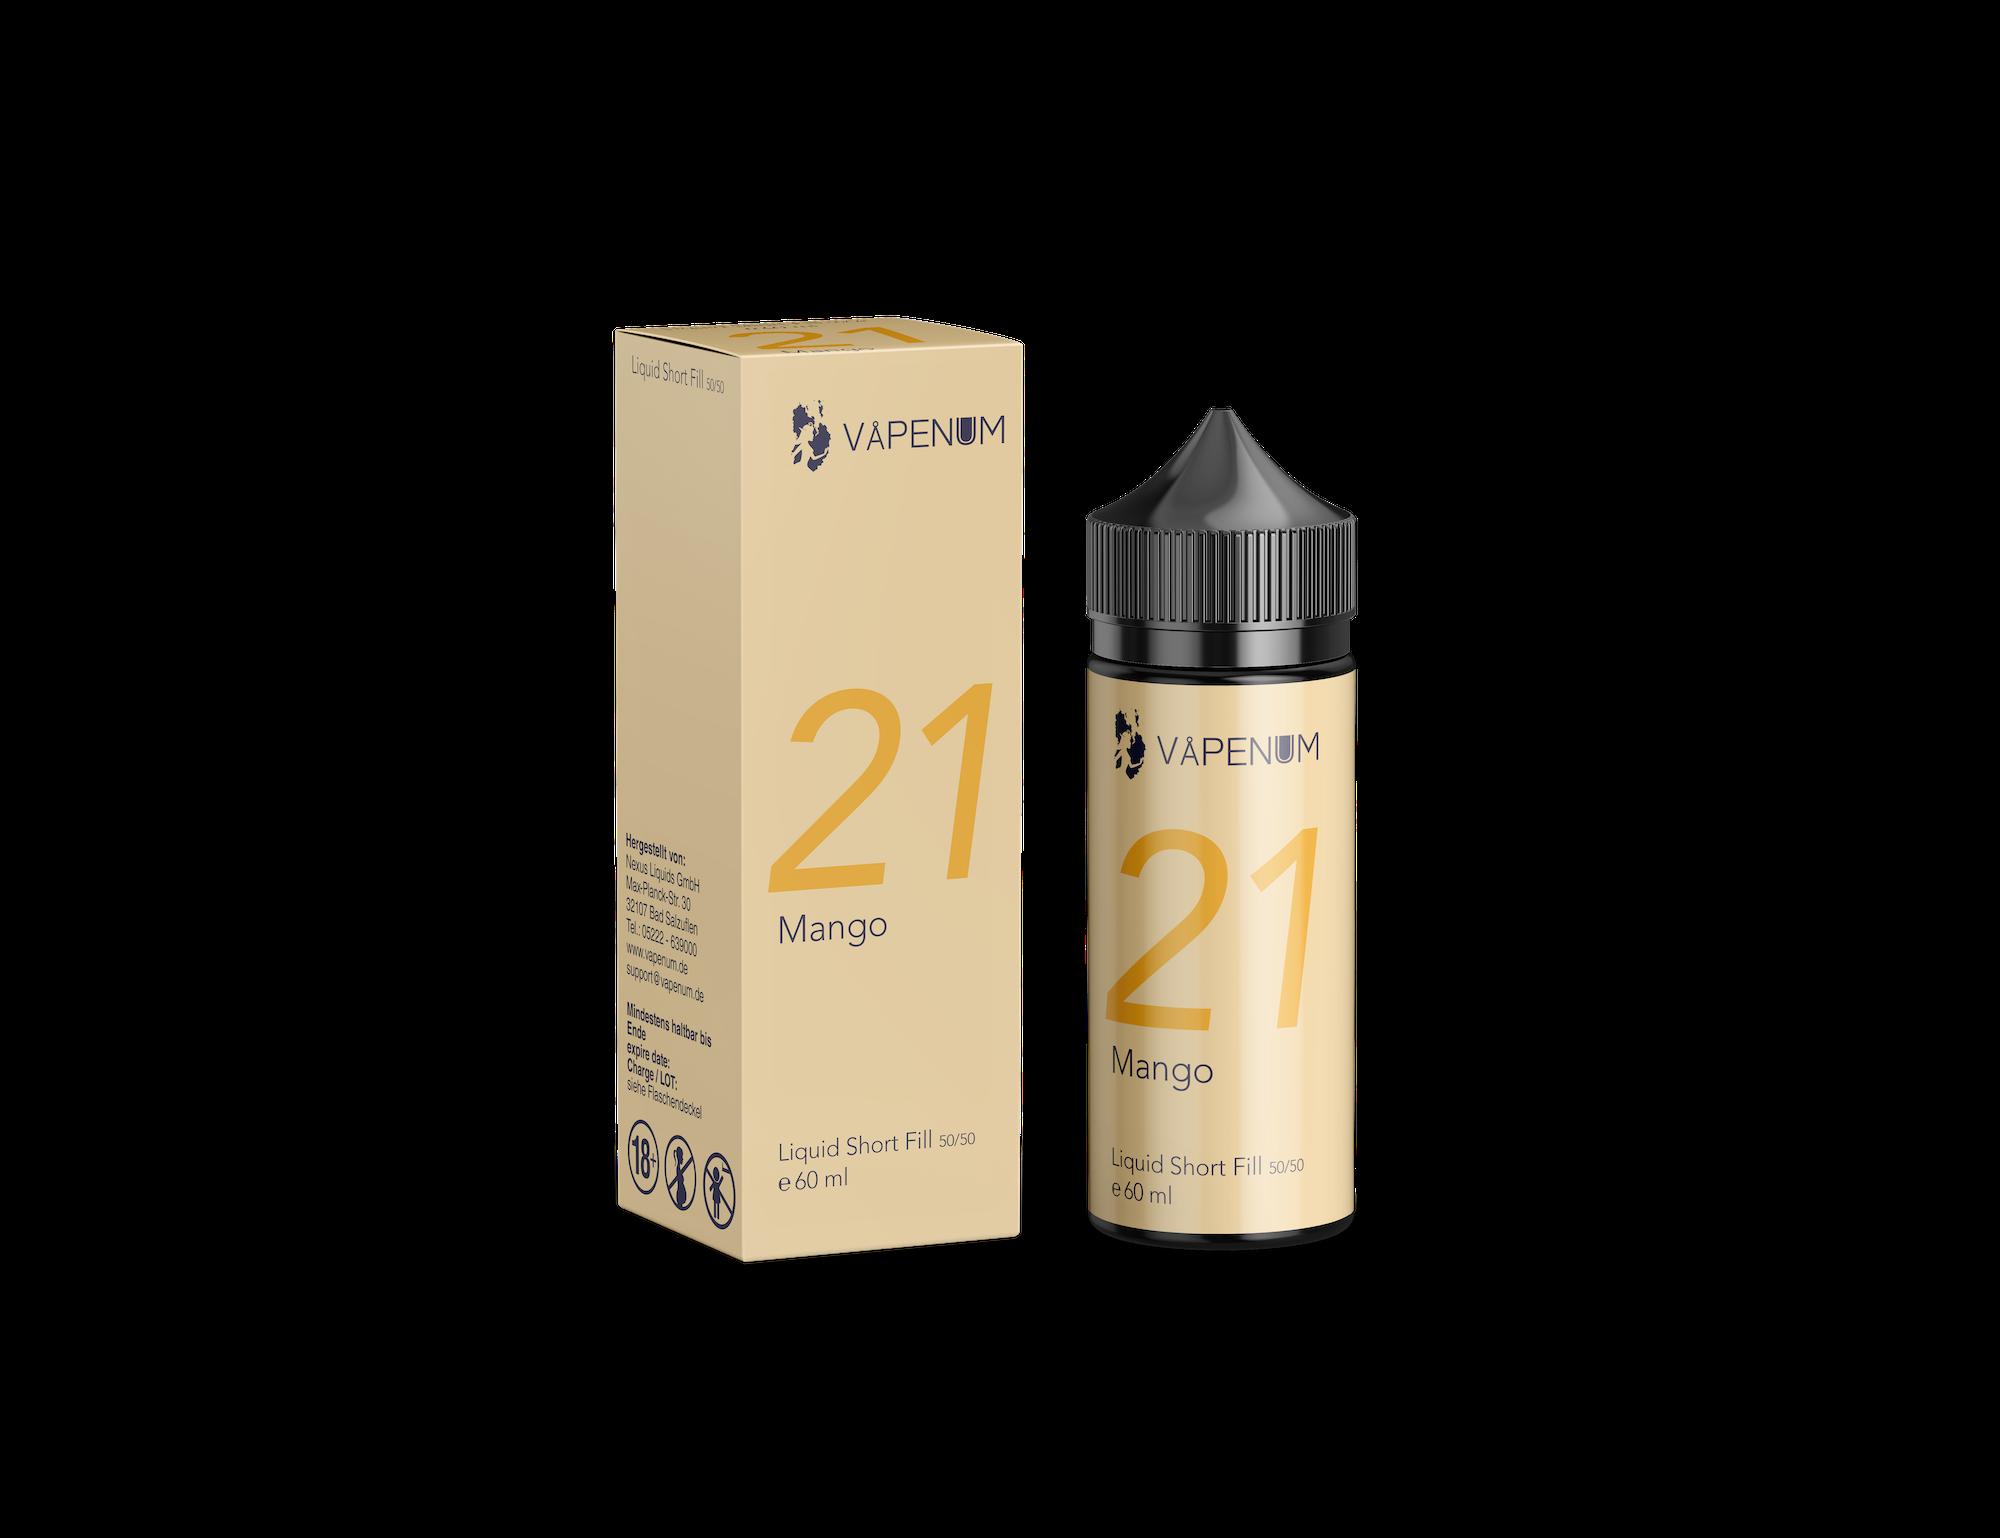 Vapenum Shortfill 21 - Mango